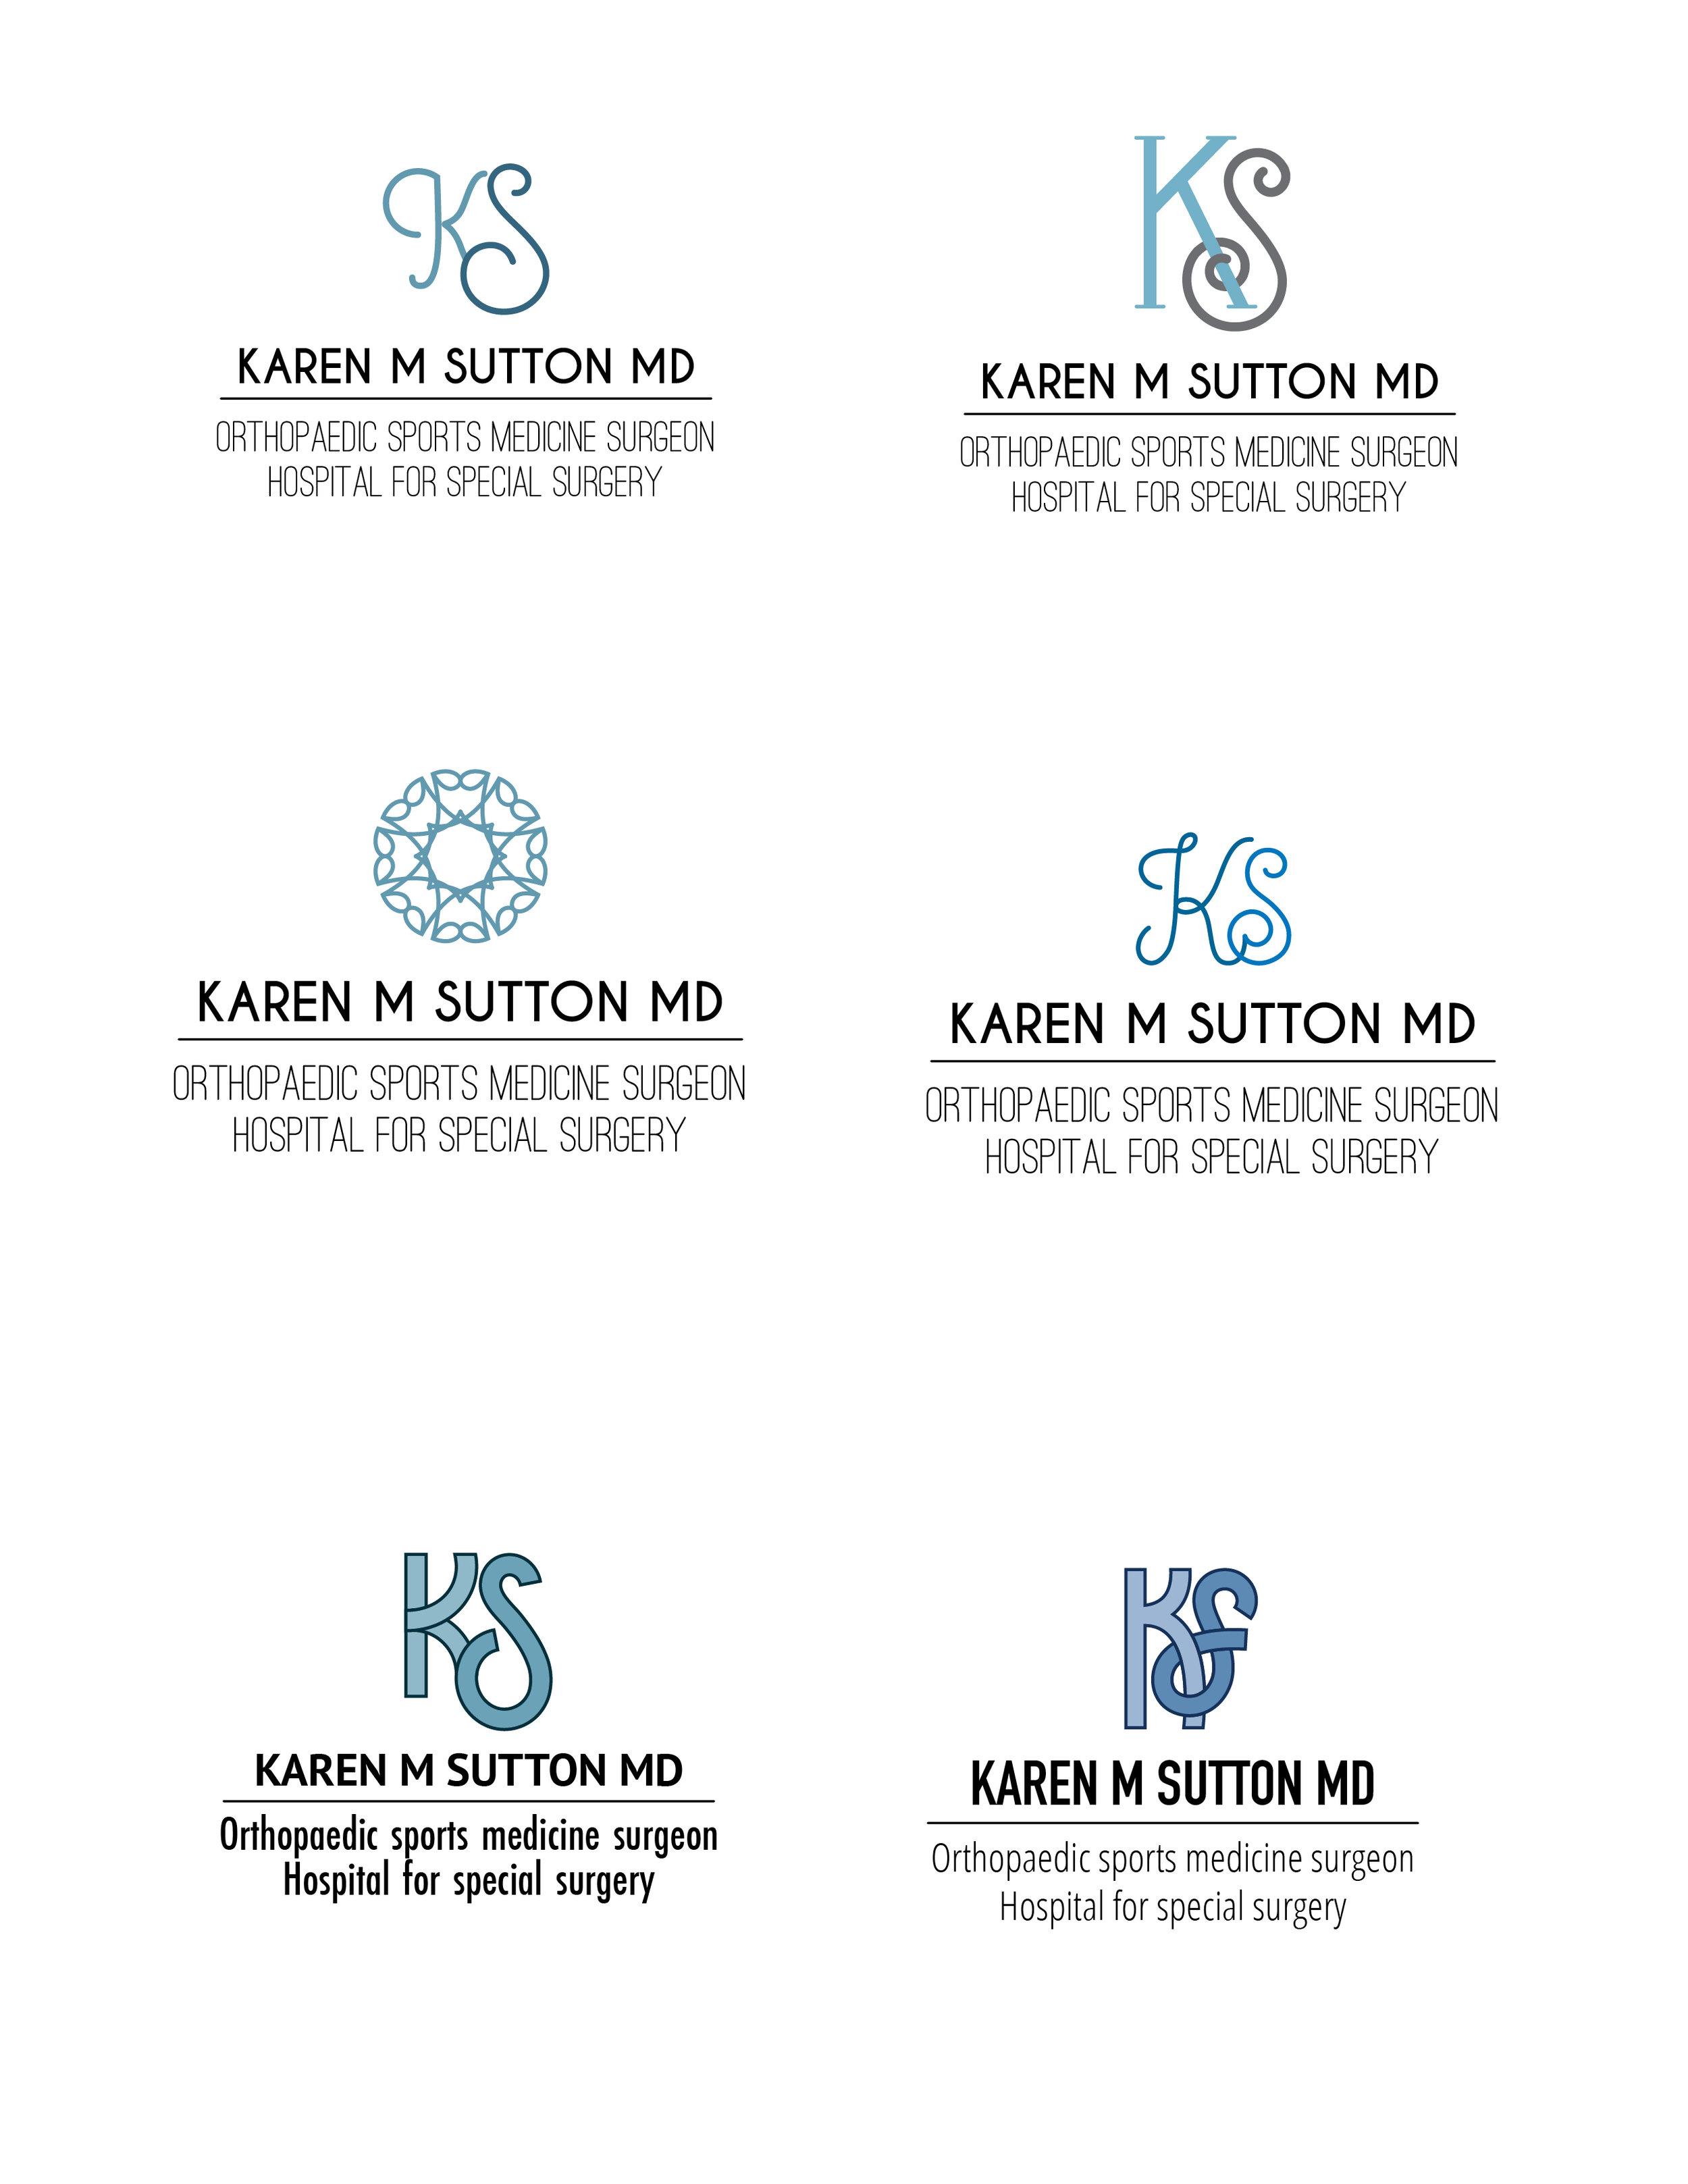 KarenSuttonLogoOptions copy 2-01.jpg